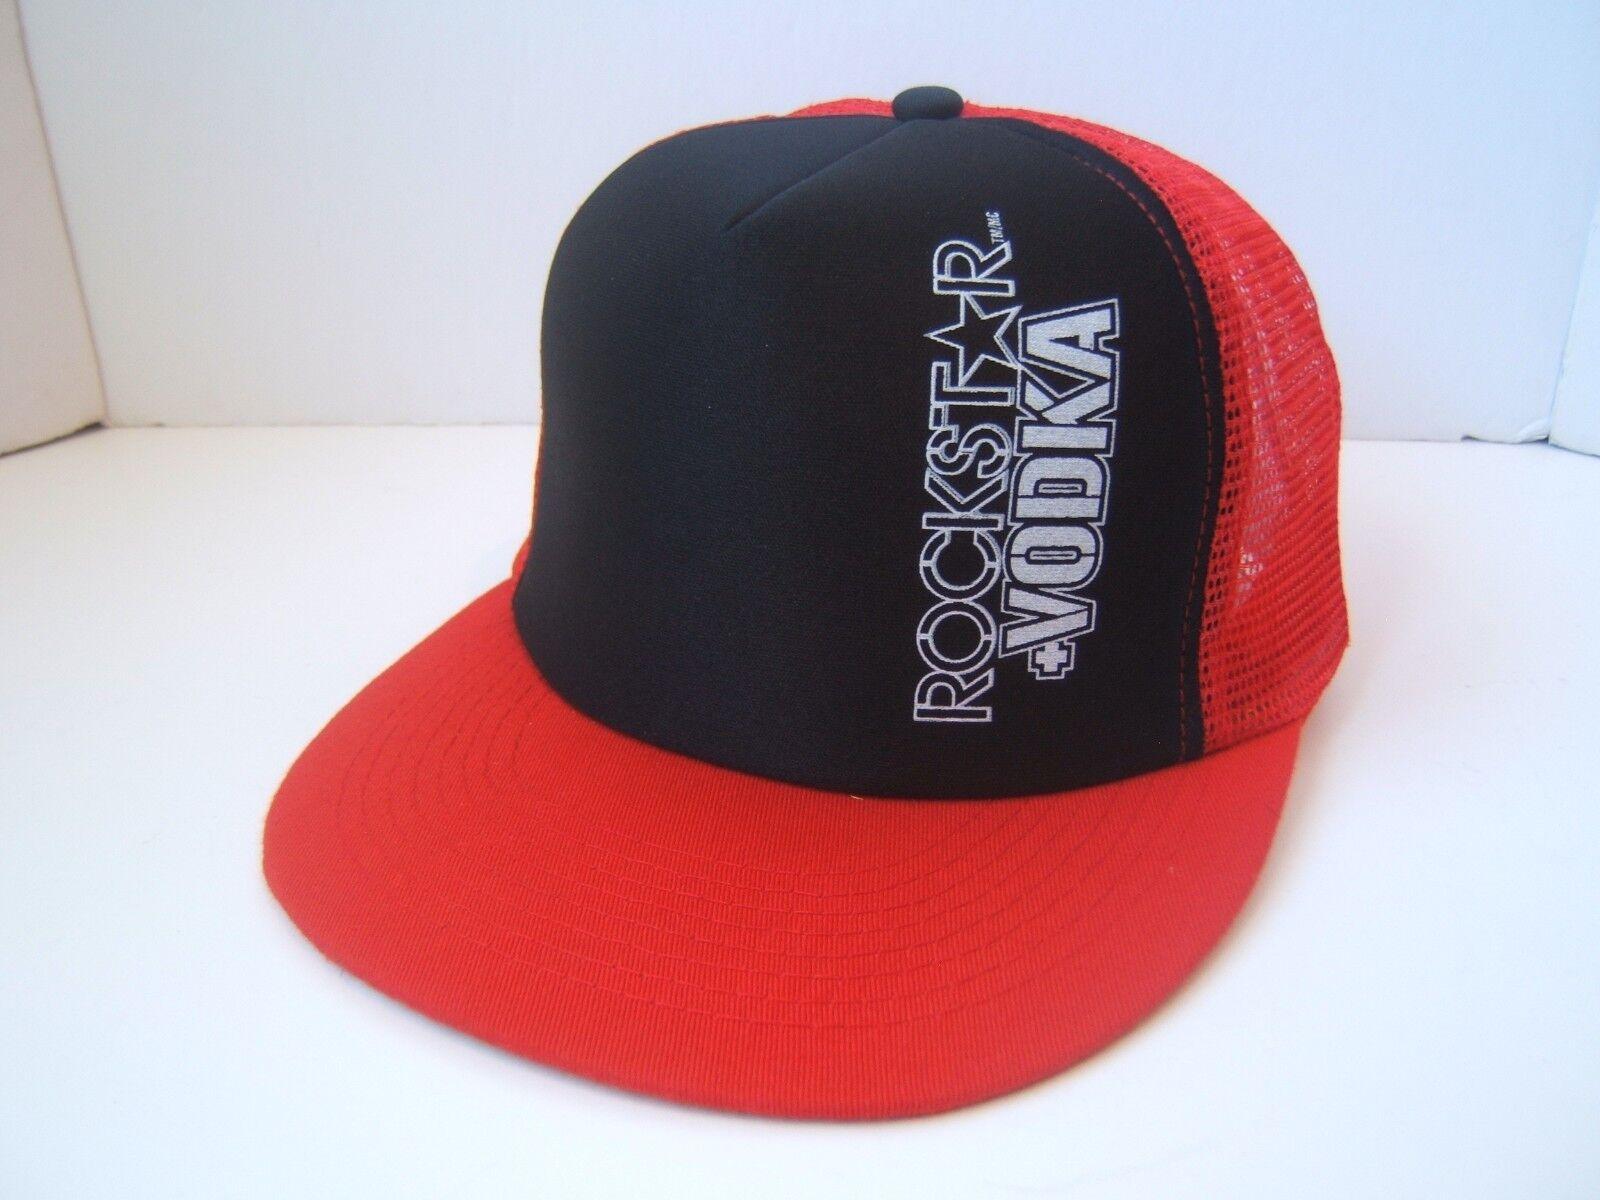 Rockstar Vodka Spell Out Trucker Hat Red Black Snapback Trucker Out Cap 926c58